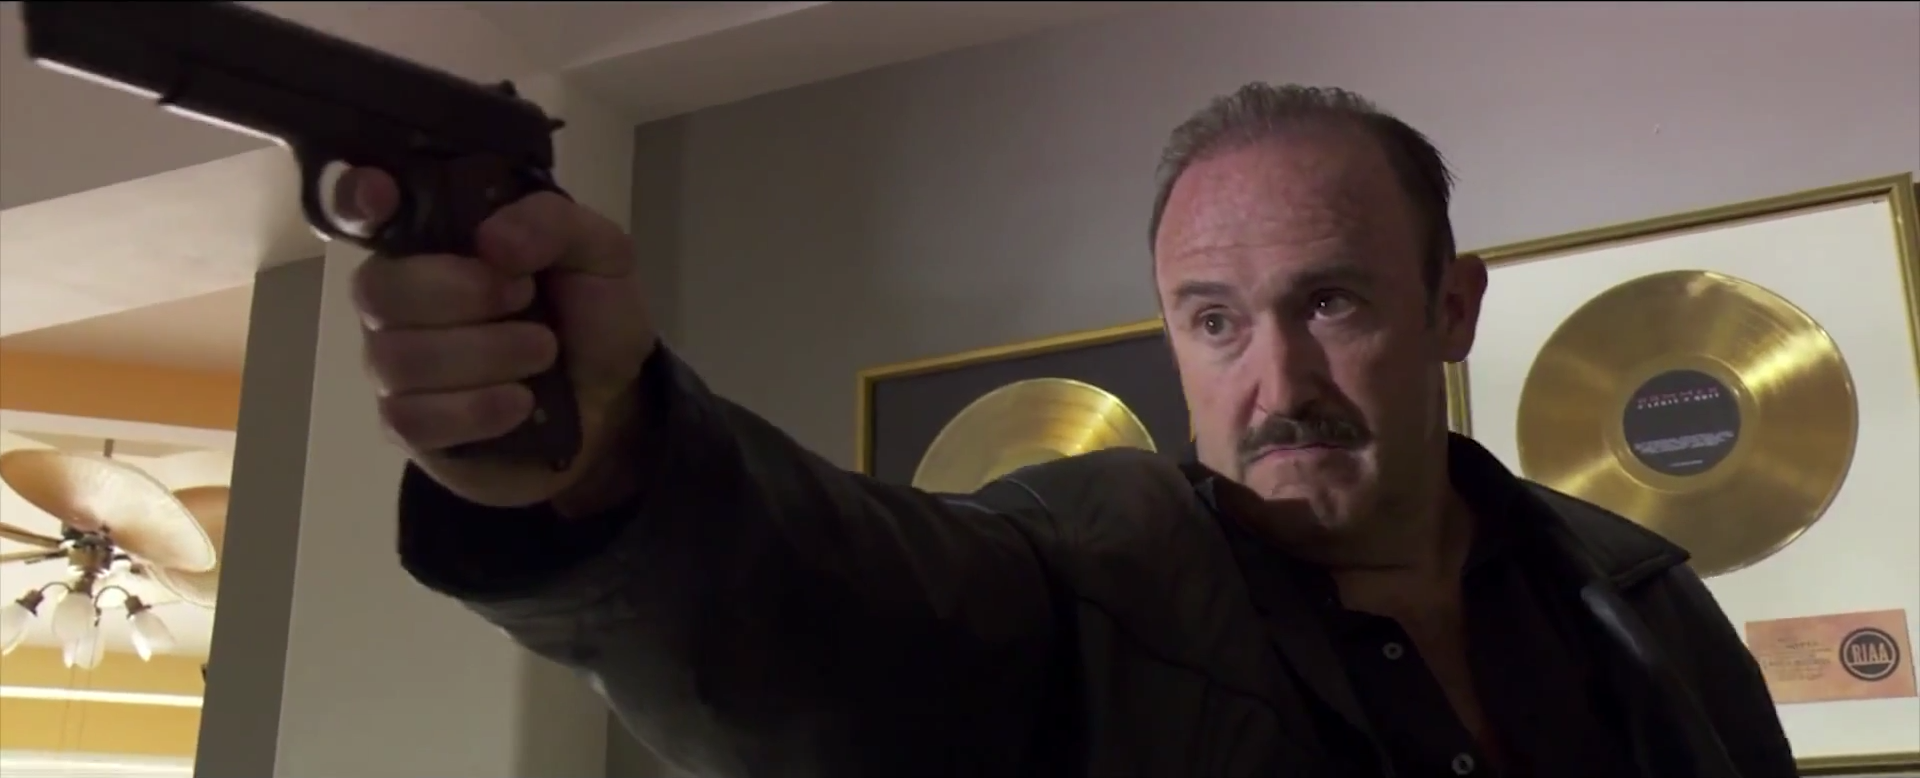 CHARLEY ROSSMAN as Bruce